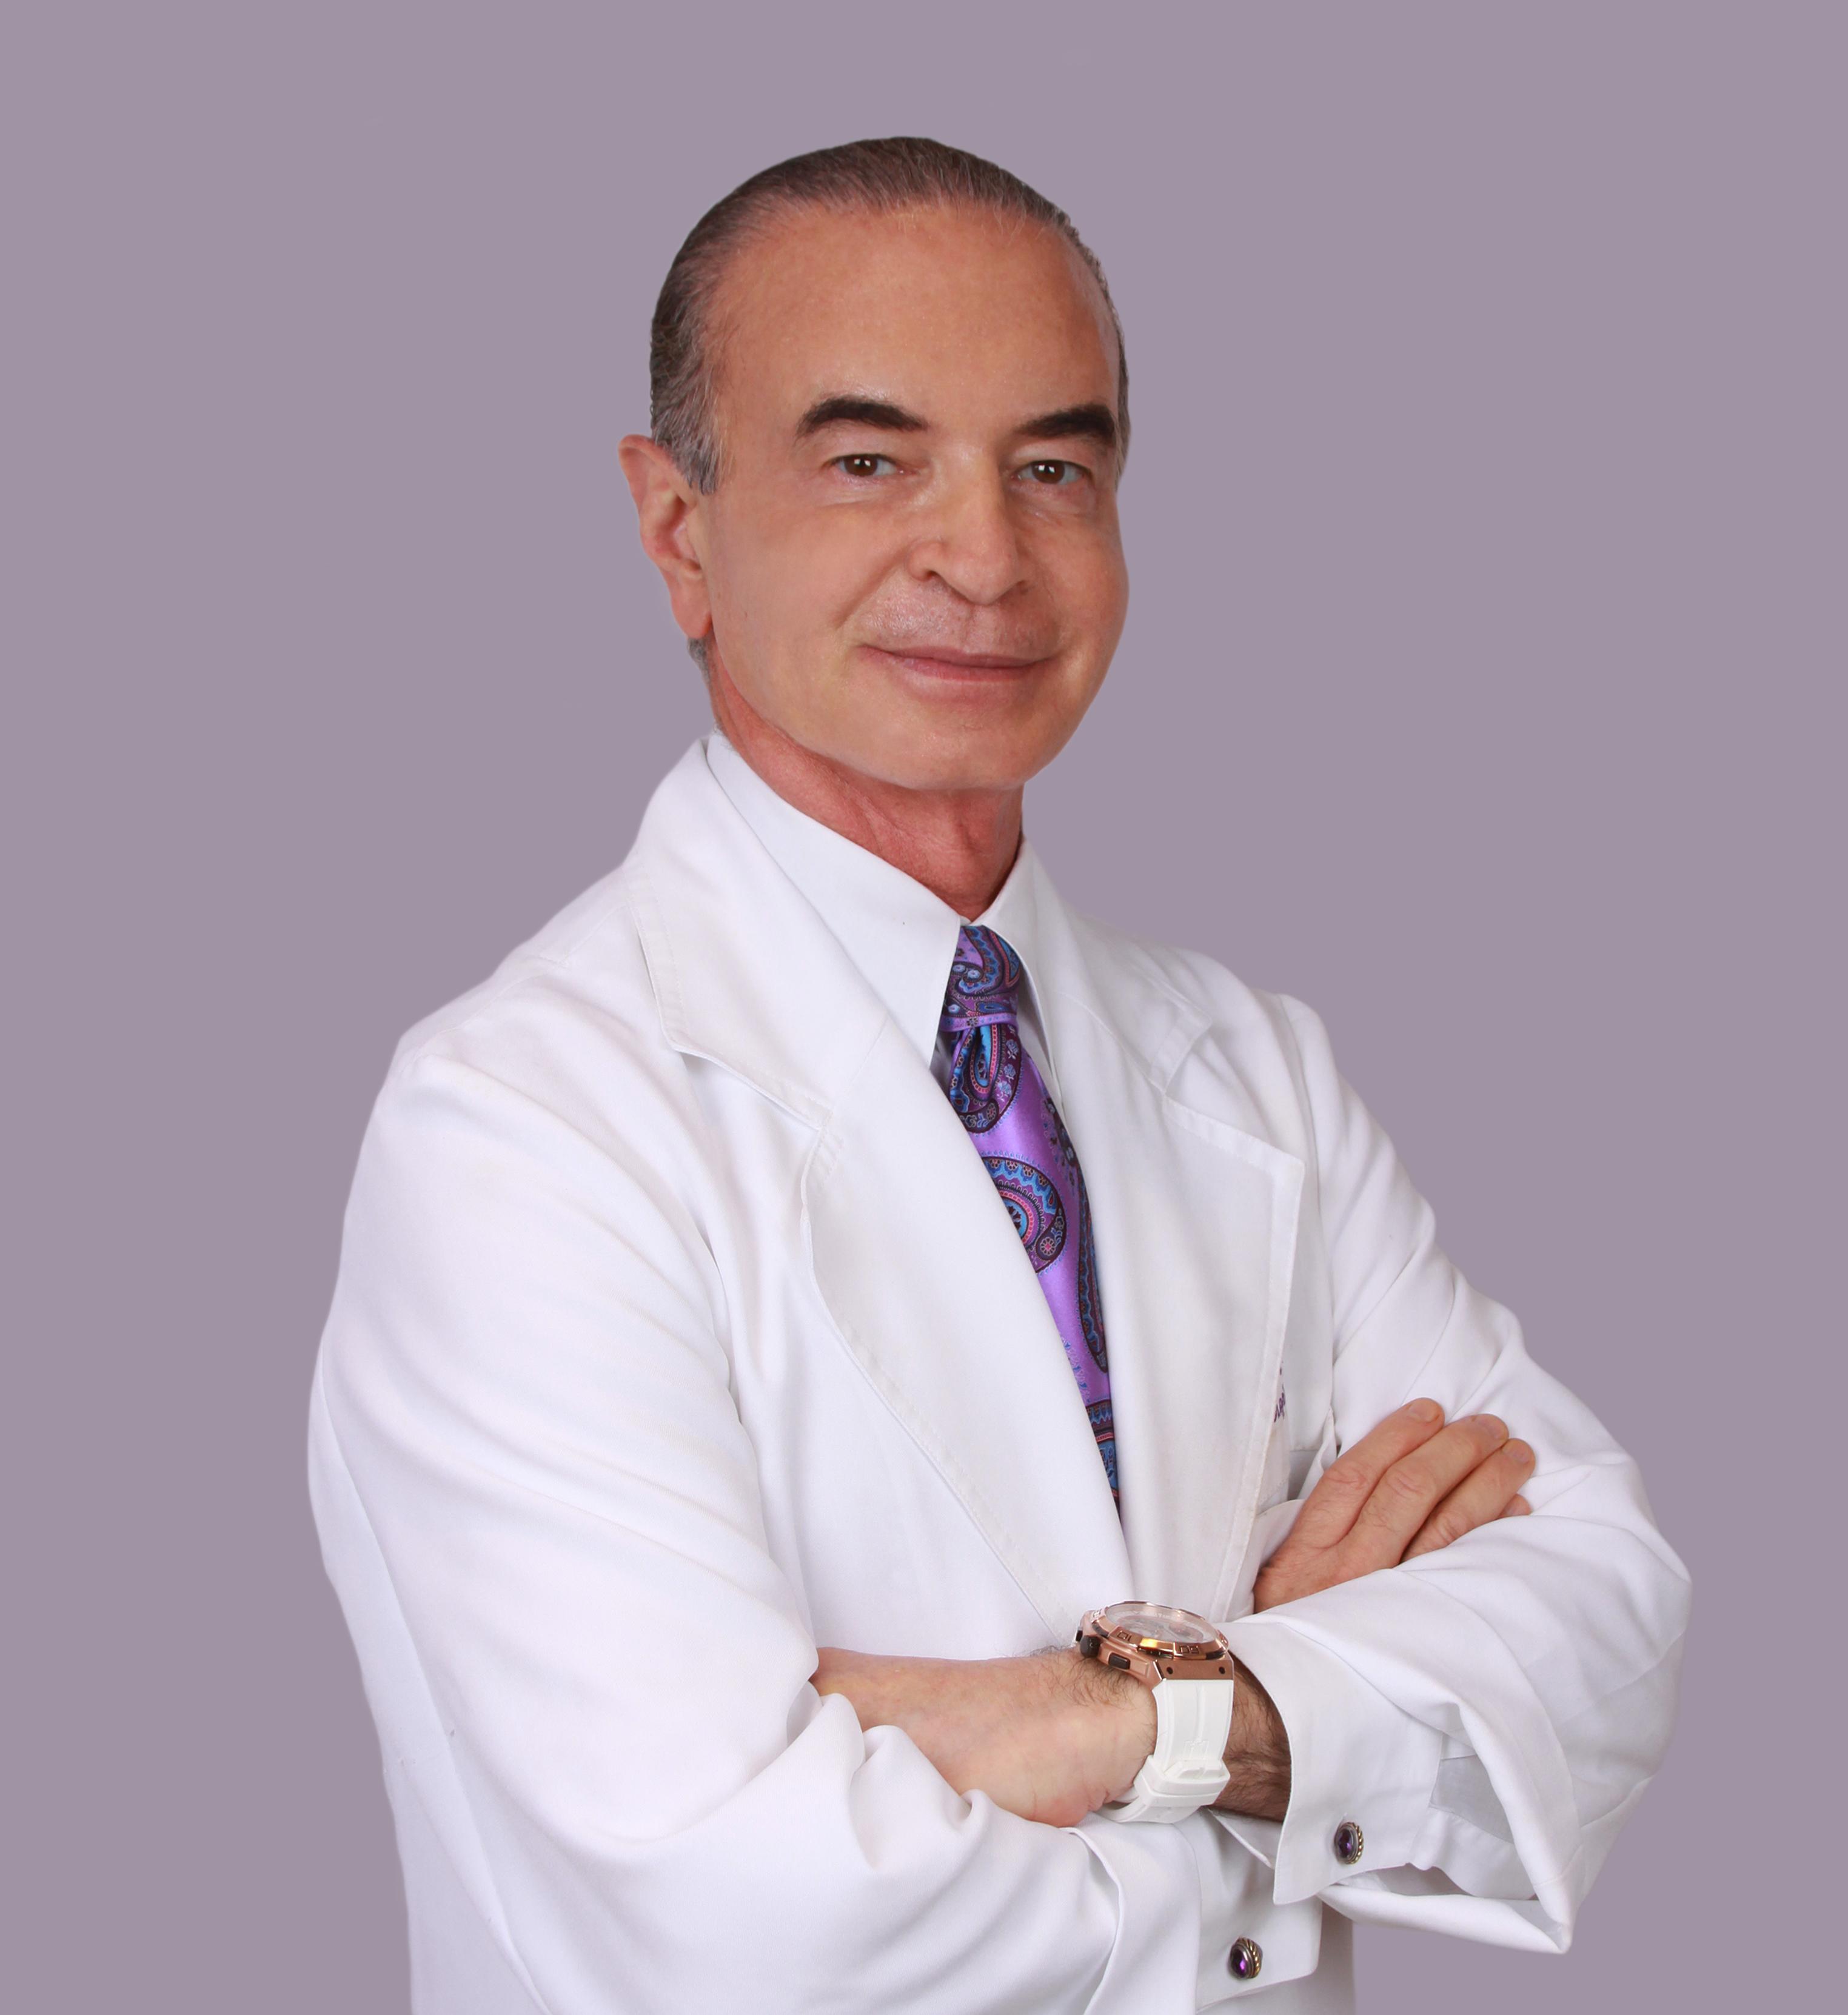 Dr. Nissan Pilest